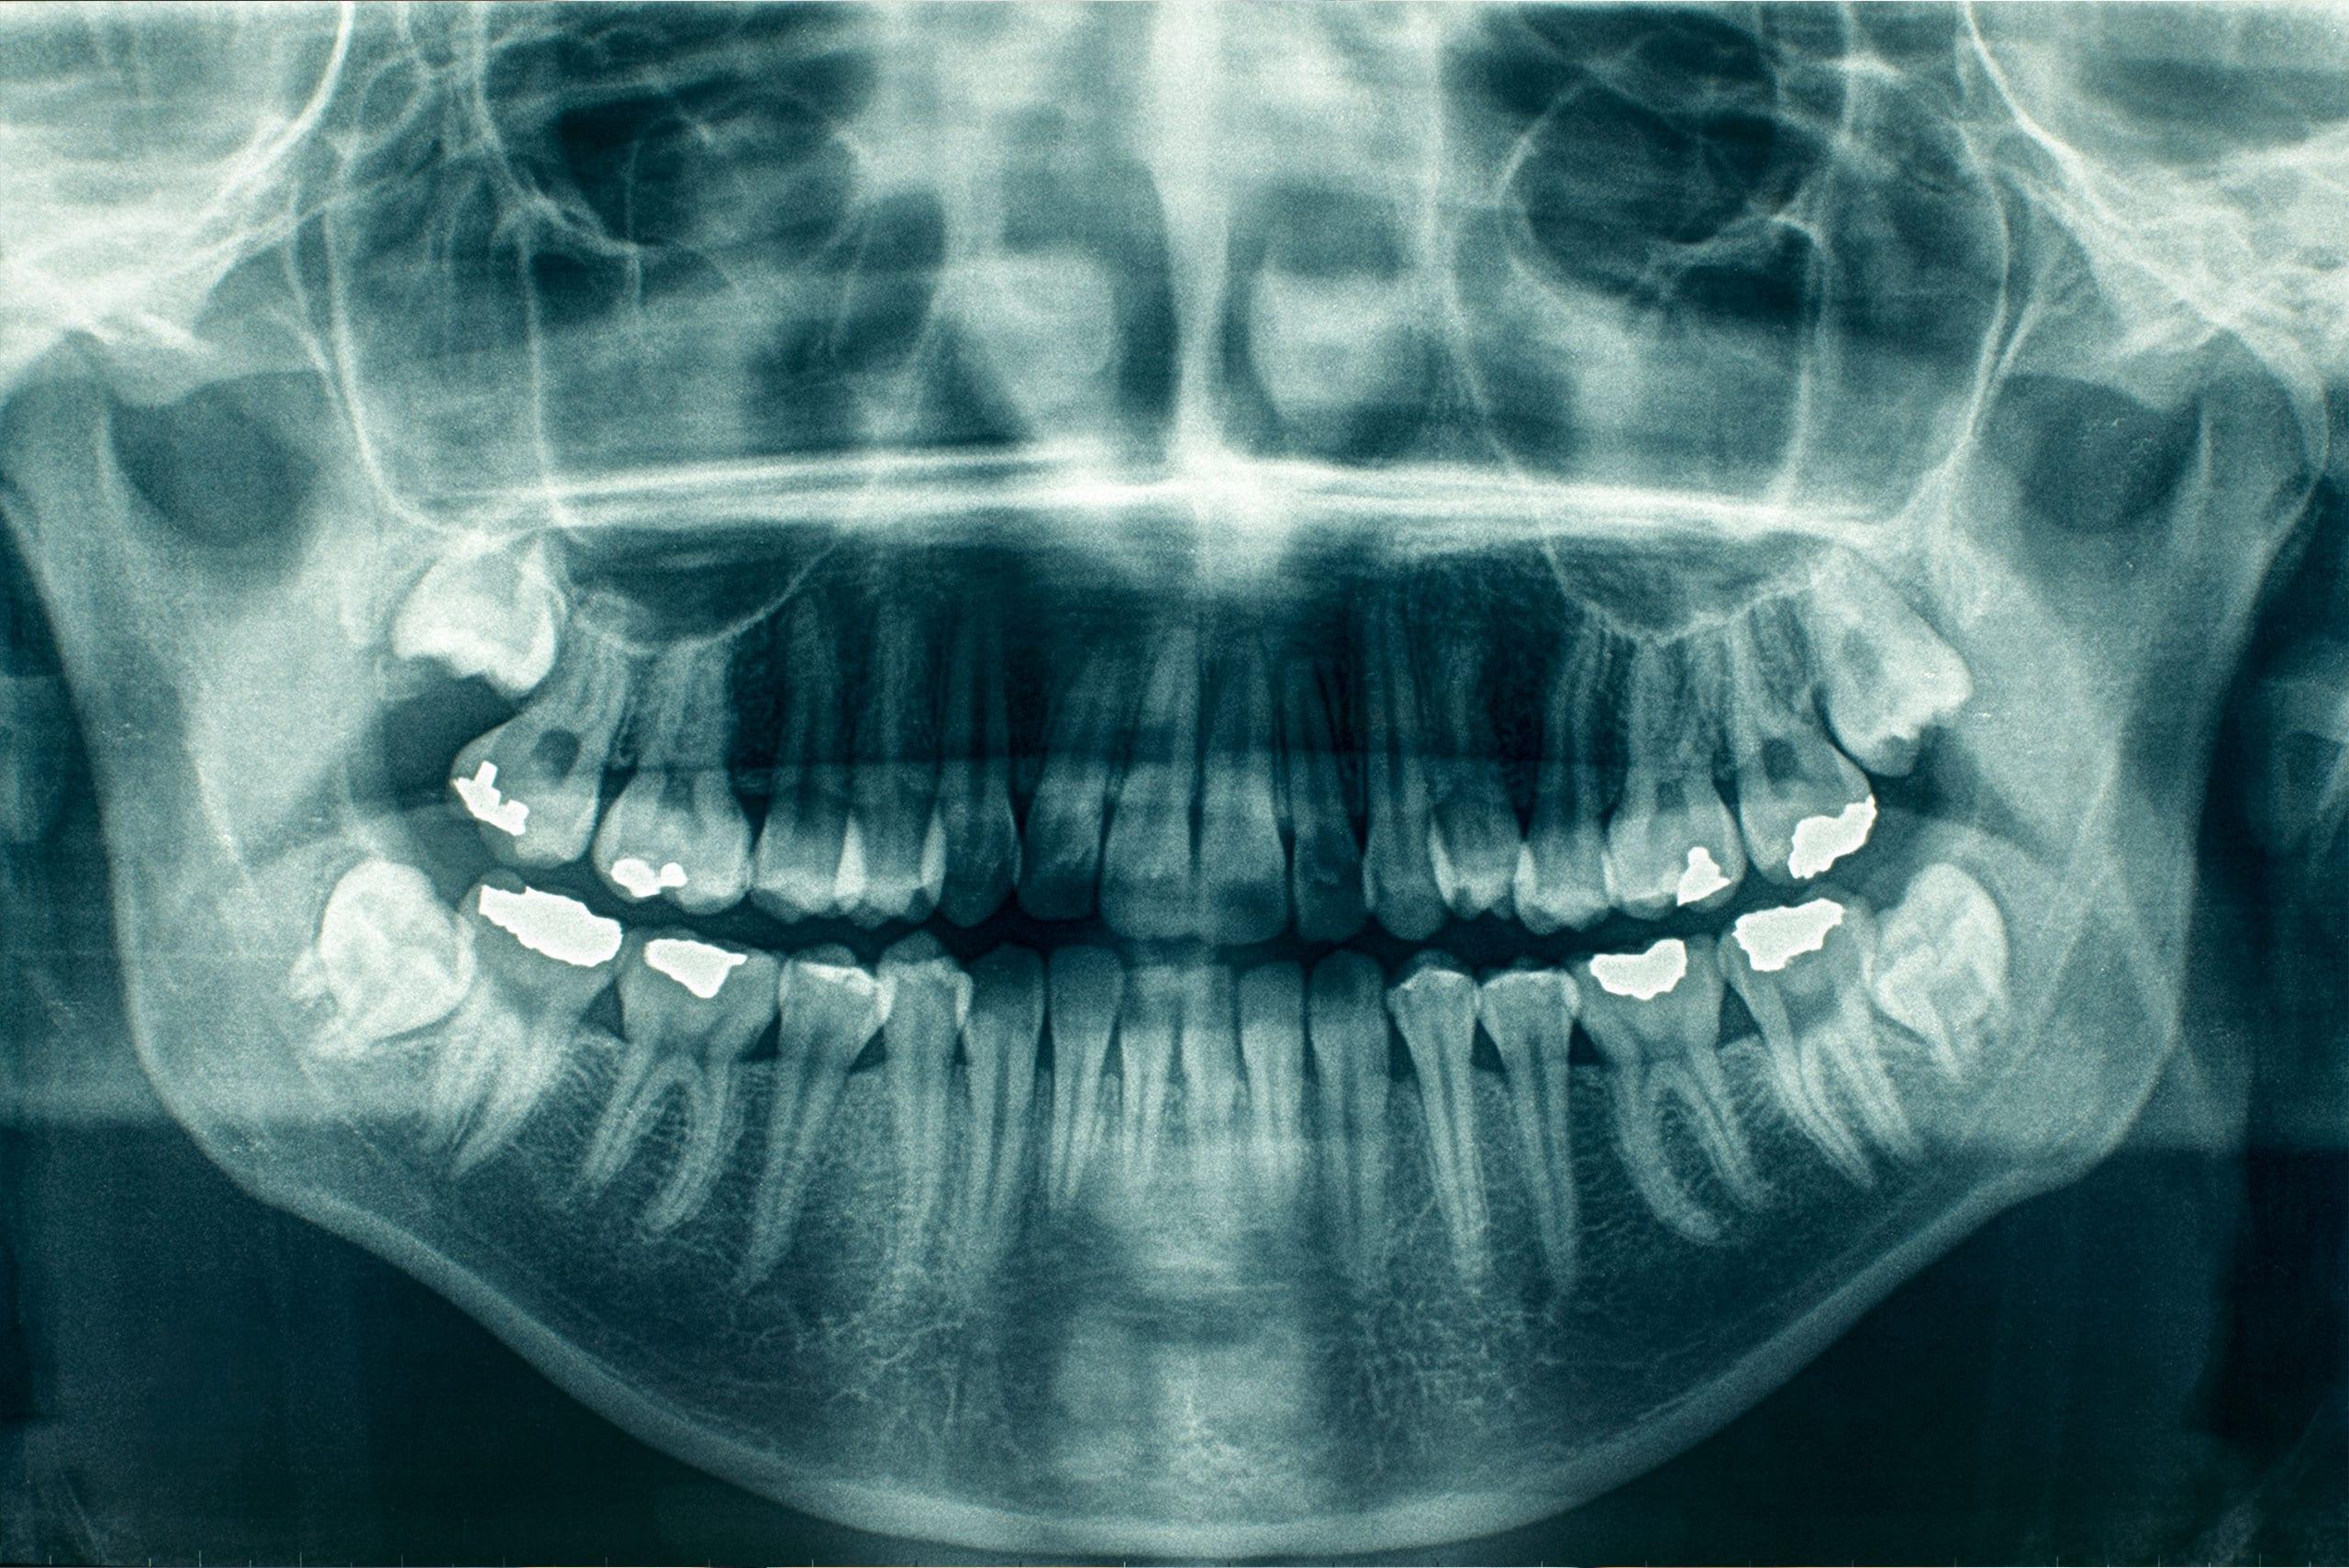 Dental Exam - Meridian Dentist - Riverbend Family Dental - Dental Xrays